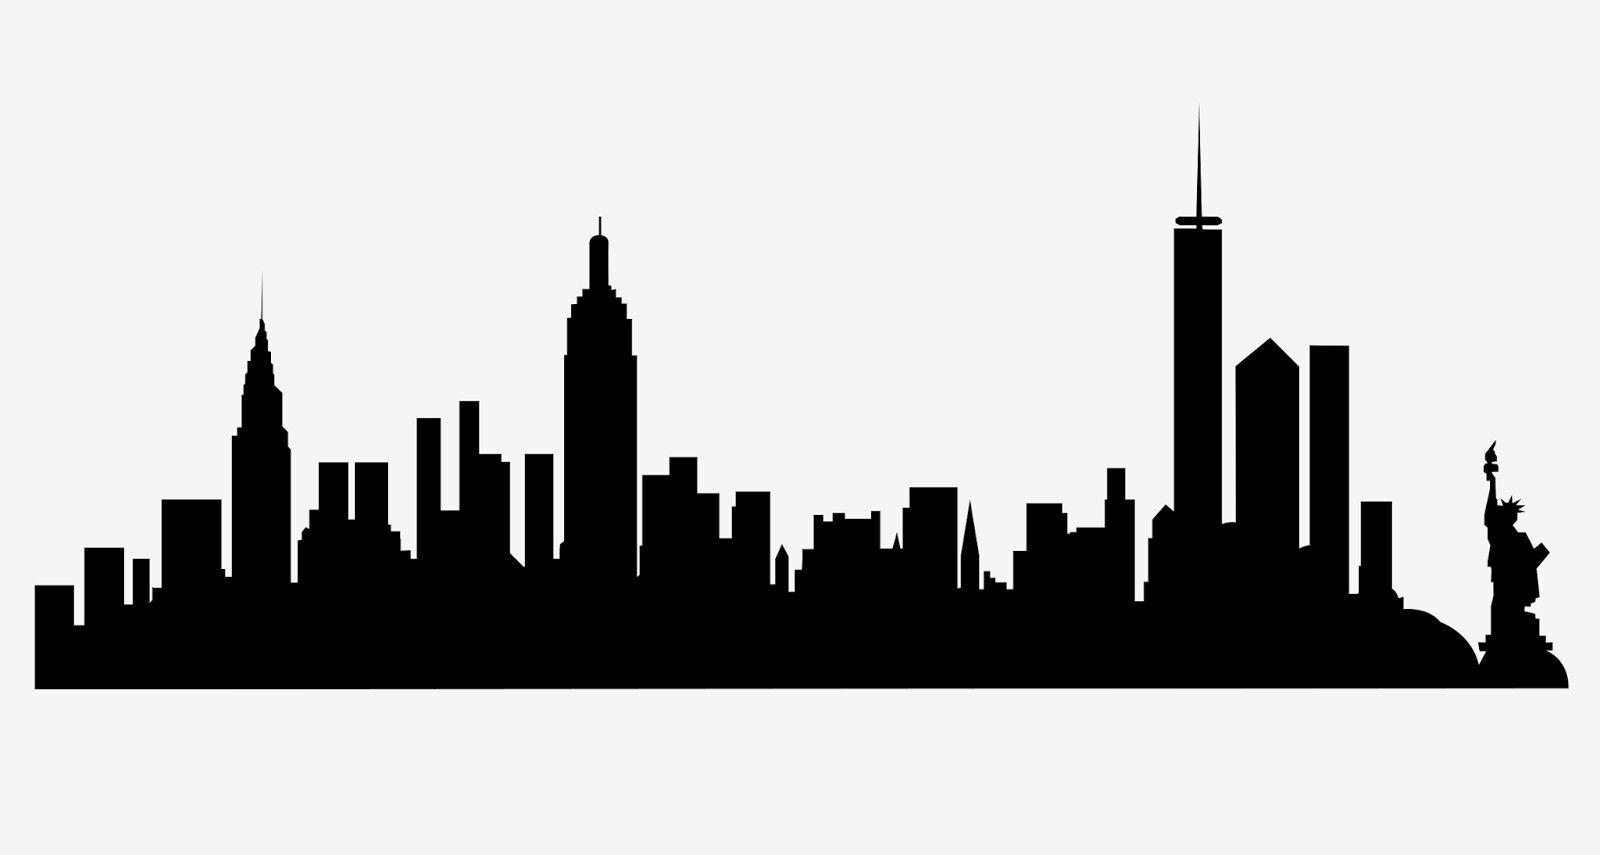 Pin By Janna Linae On Eye New York Skyline Silhouette City Skyline Silhouette Ny Skyline